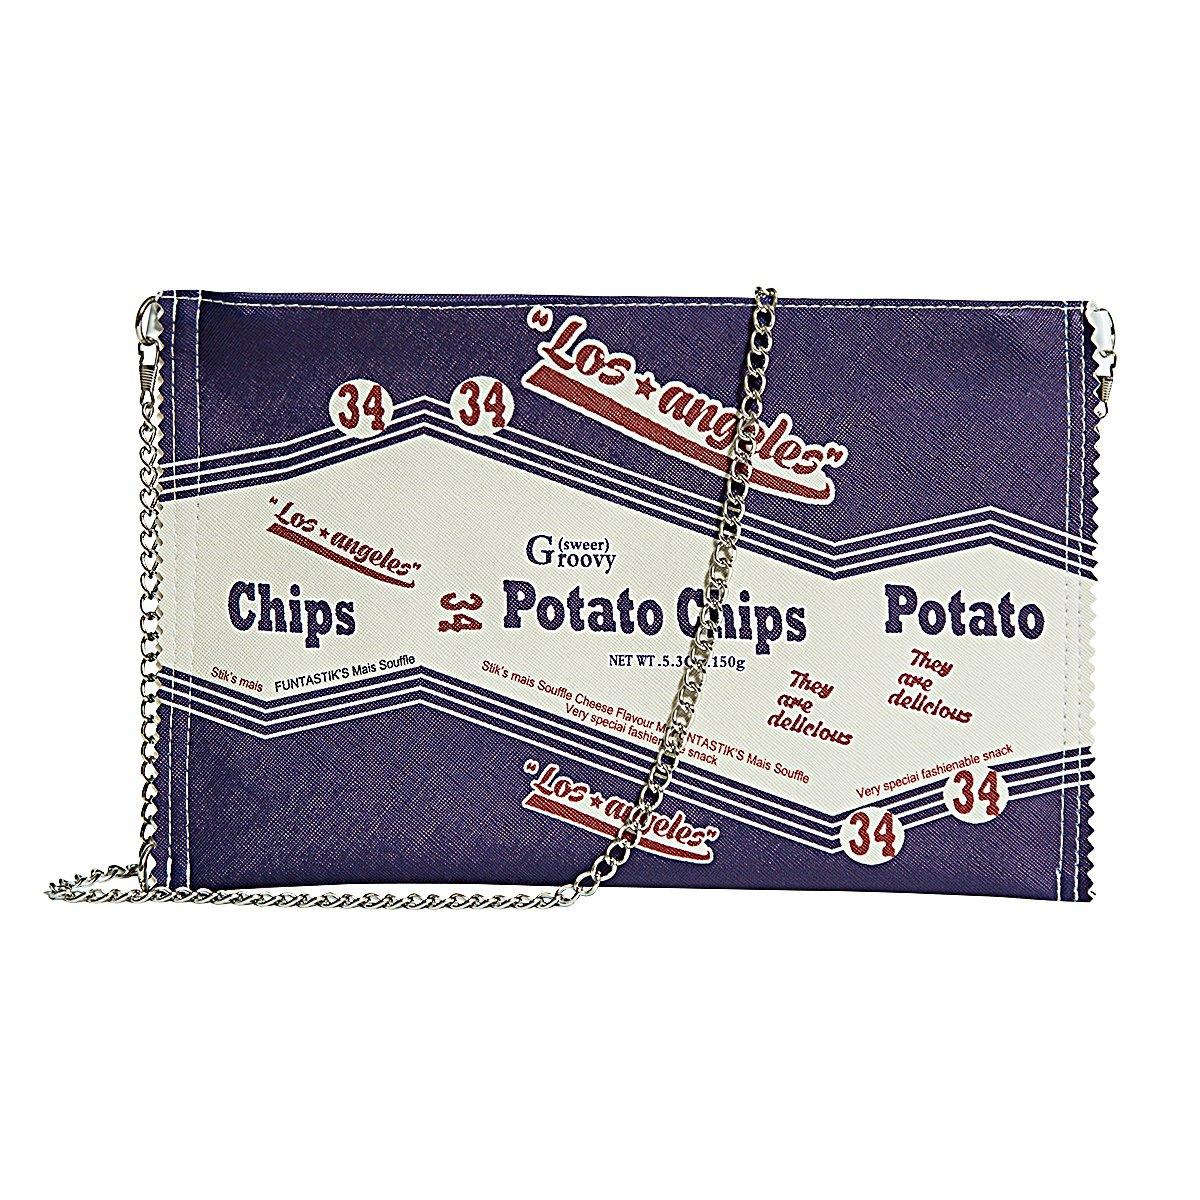 9b9d08323504 Zarapack Women's Pu Leather Yummy Potato Chips Vintage Style Clutch ...